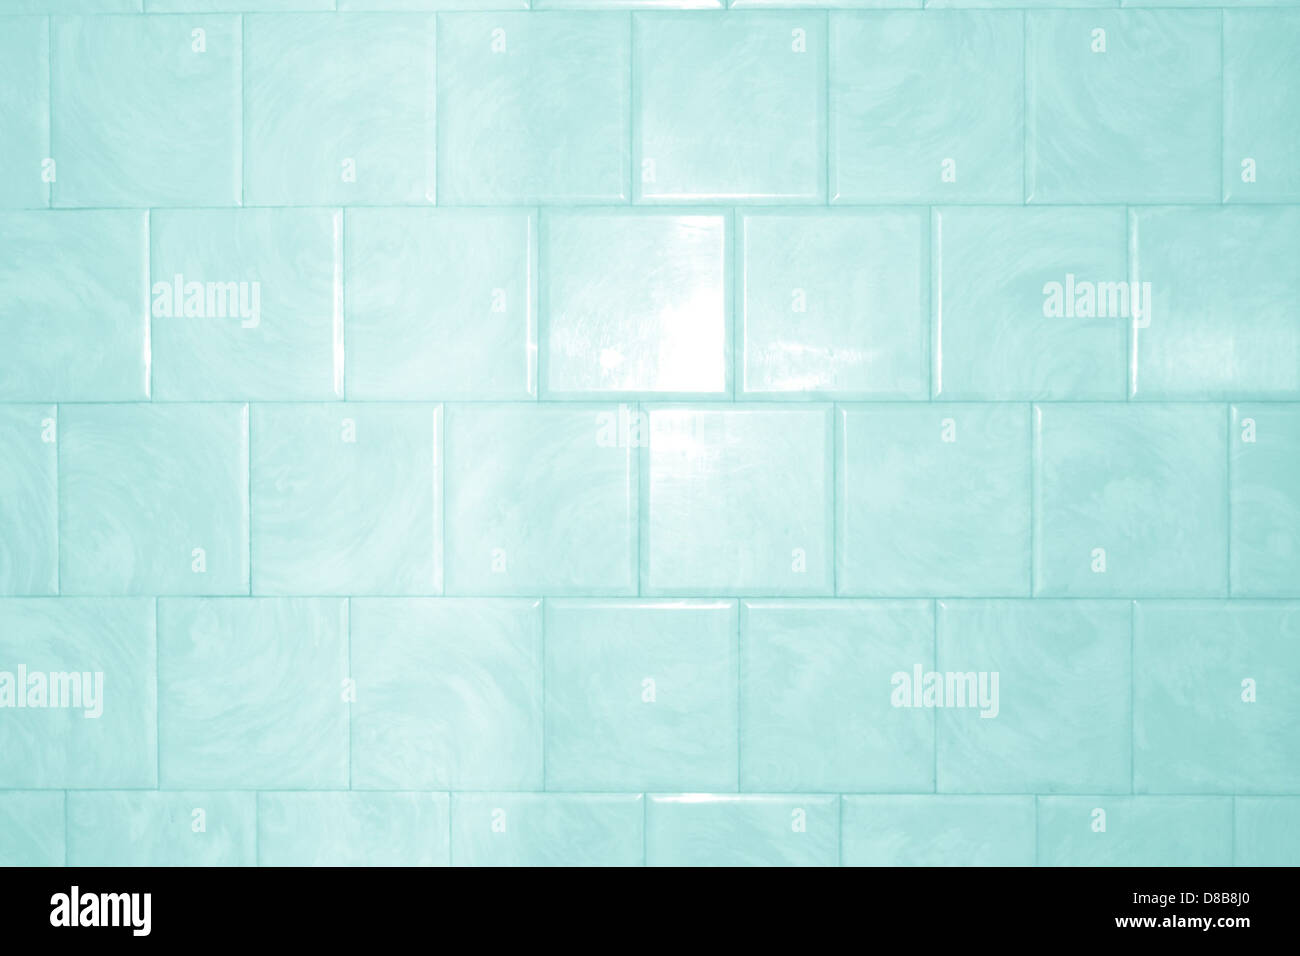 aqua teal bathroom tile with swirl pattern texture Stock Photo ...